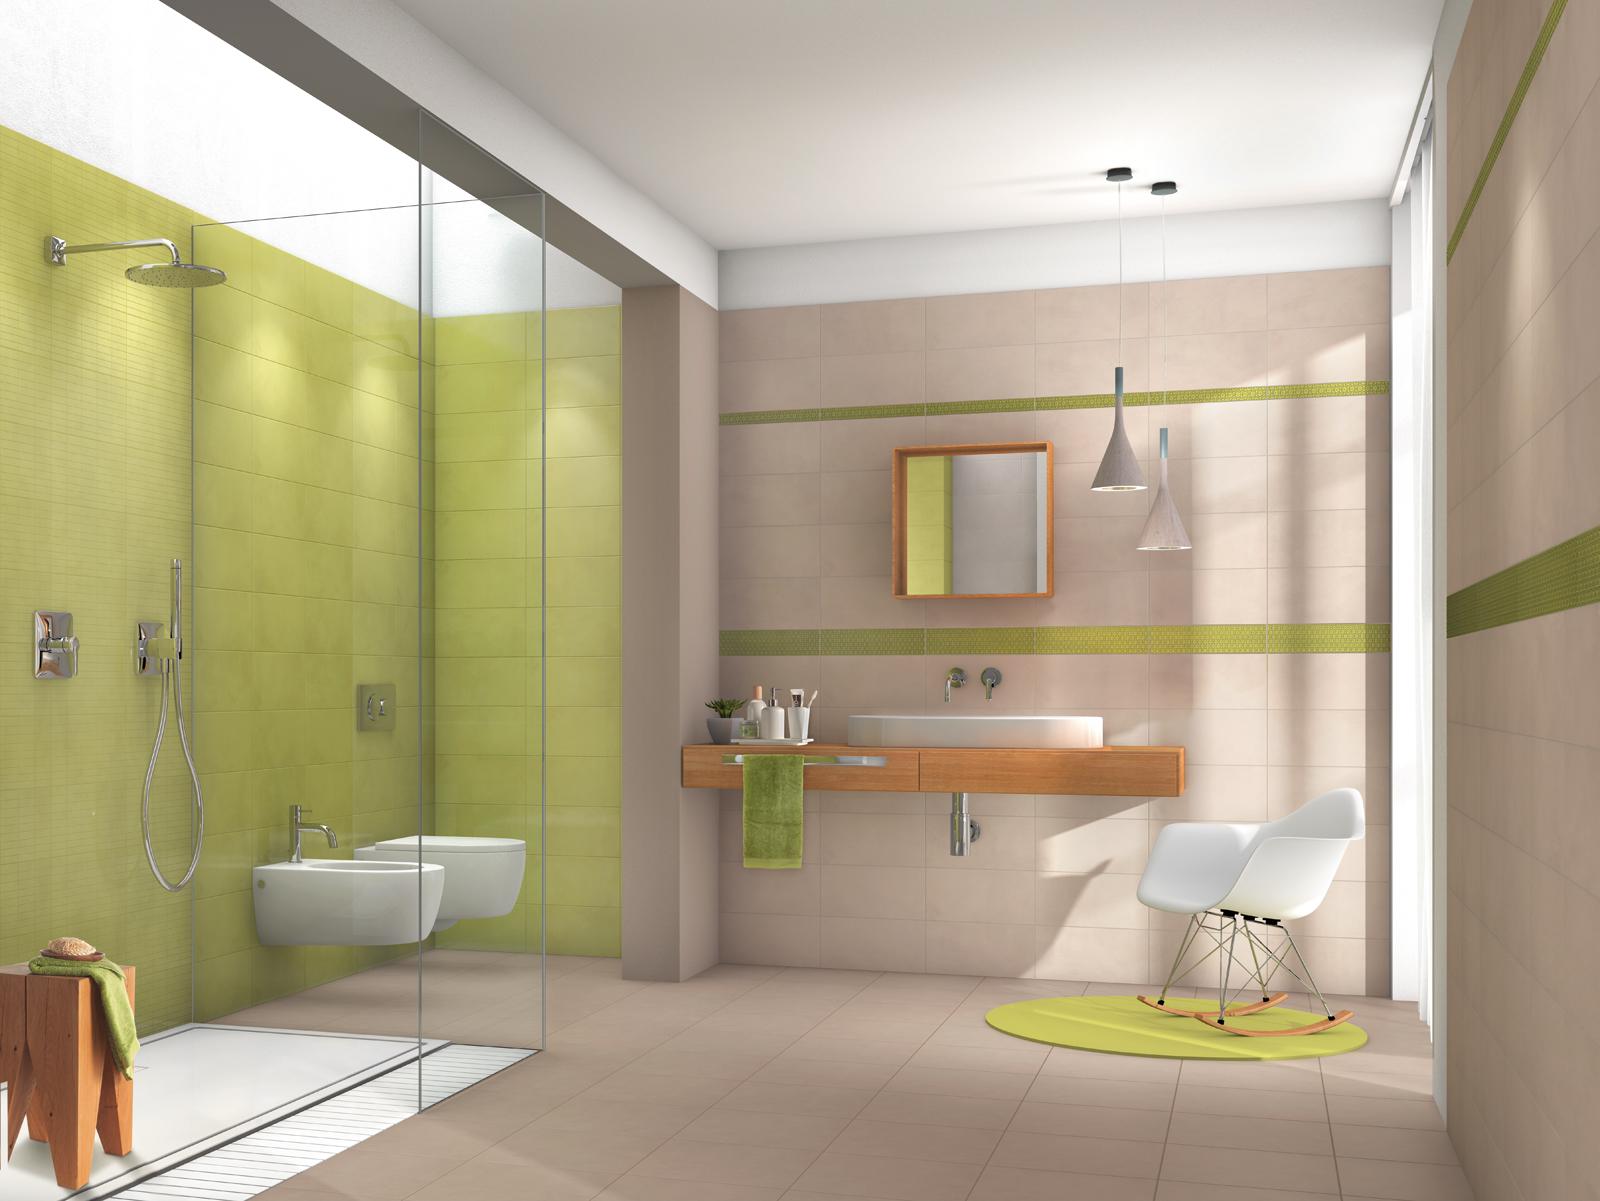 Covent Garden - Rivestimento bagno e cucina  Marazzi